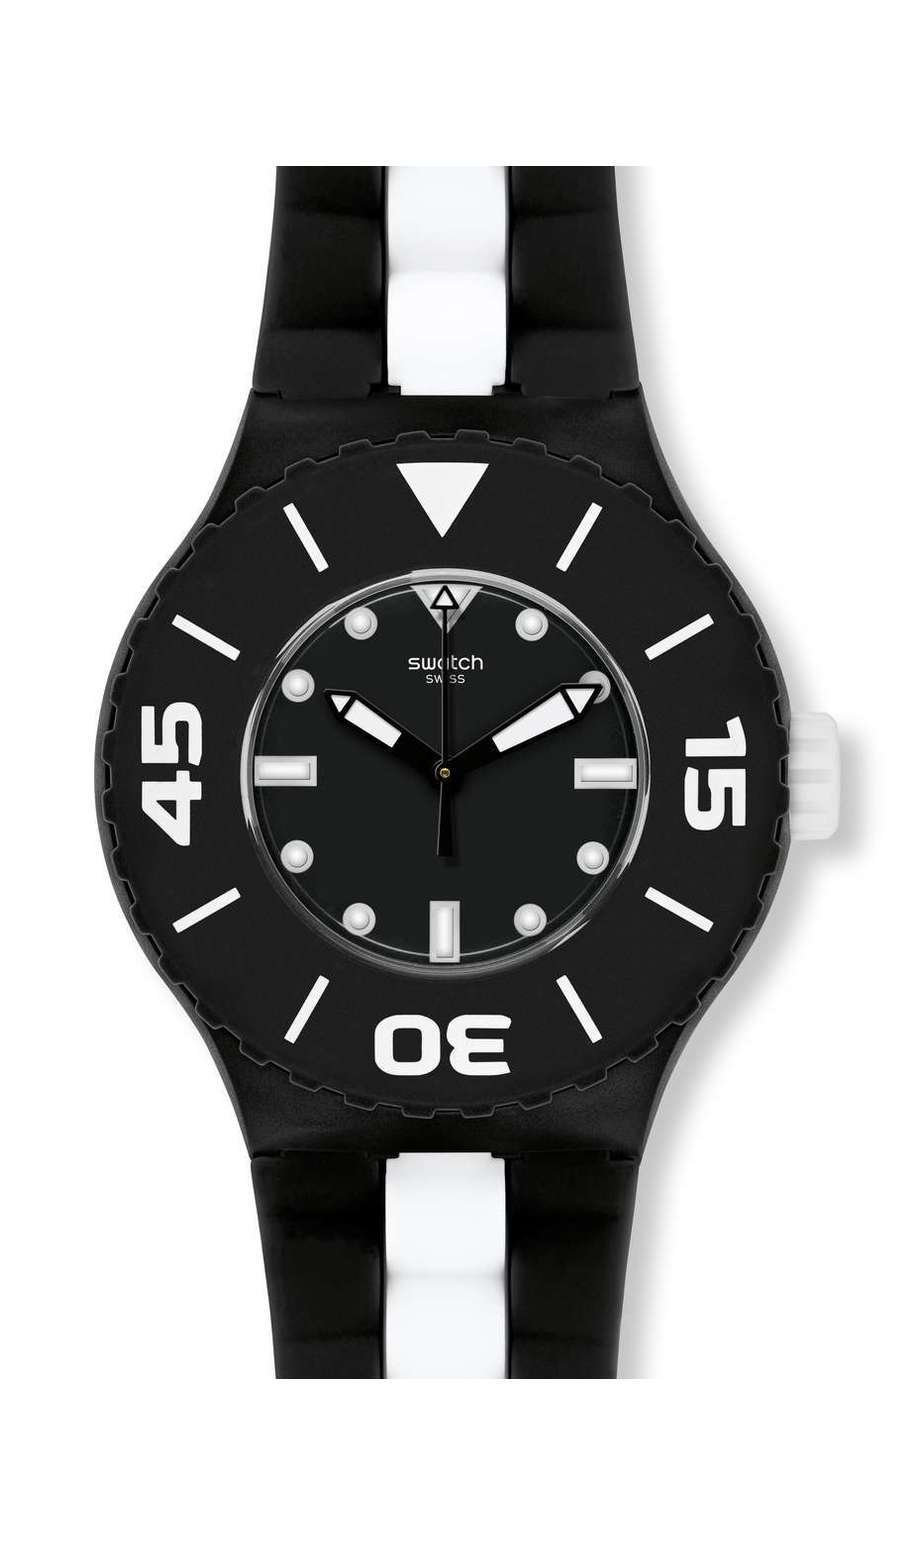 Swatch - B&W DEEP - 1